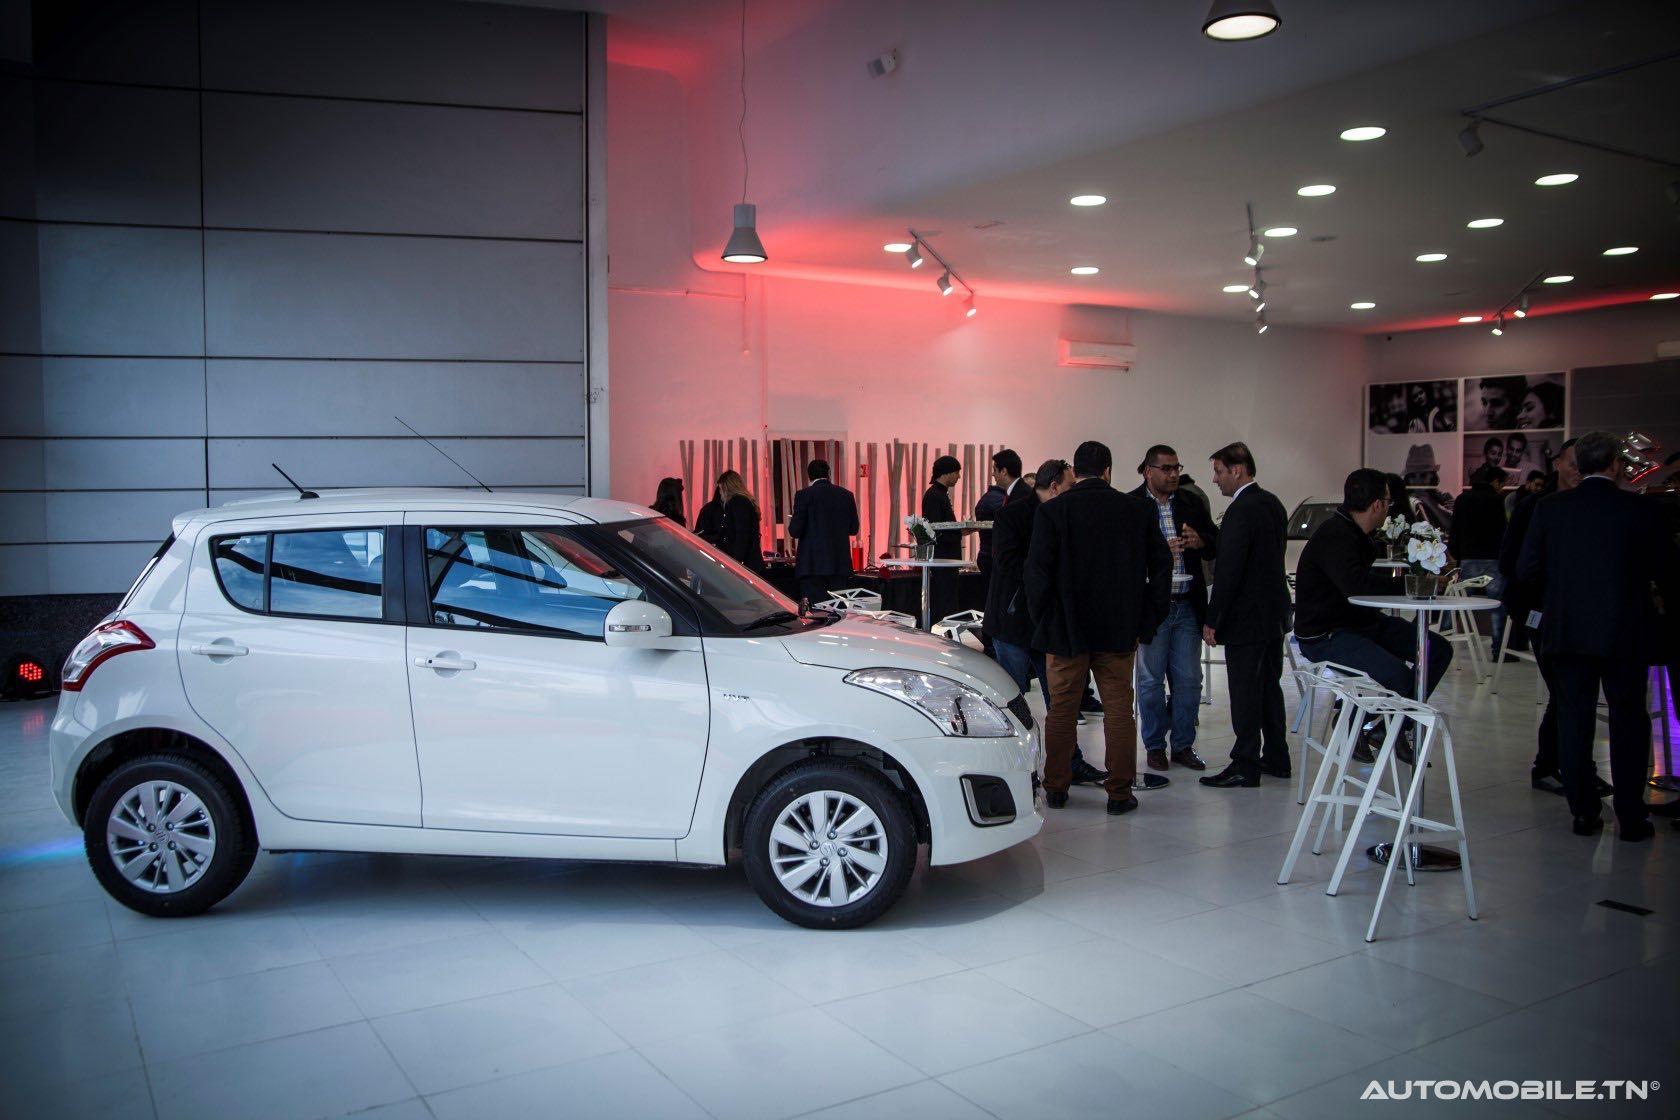 acheter une voiture en leasing acheter une voiture en leasing comment a marche acheter une. Black Bedroom Furniture Sets. Home Design Ideas